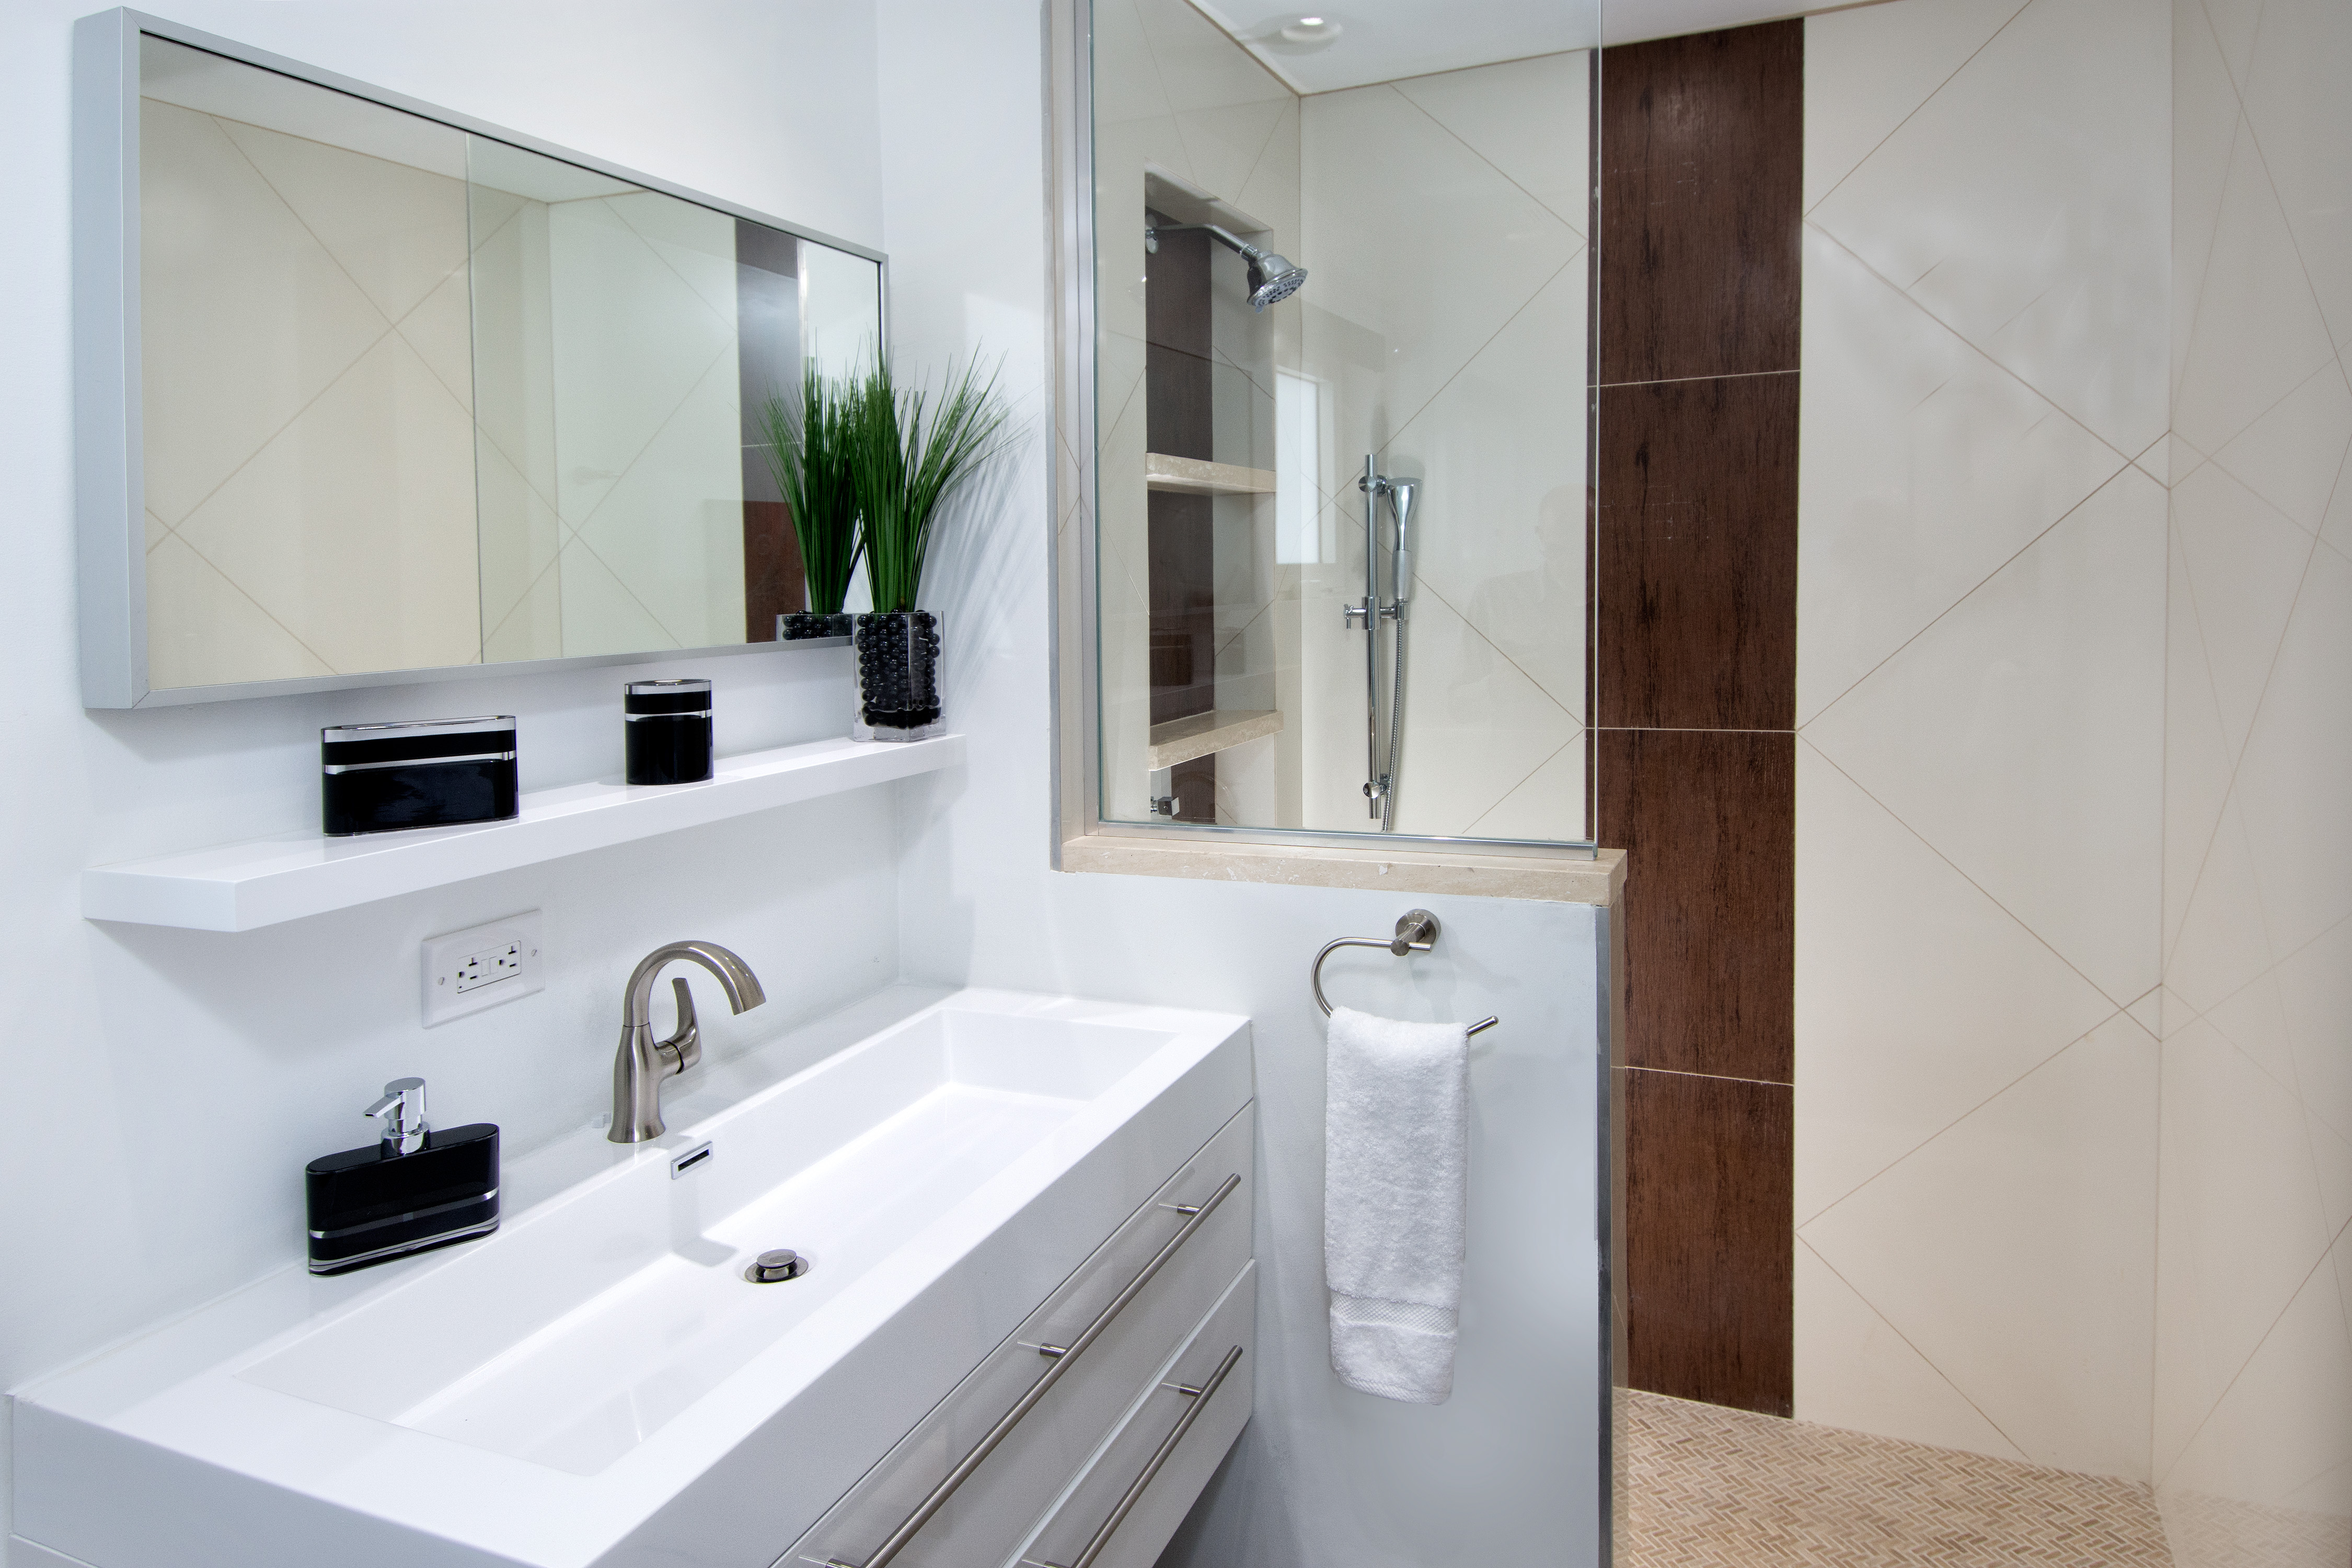 SM101 Apartment Bathroom